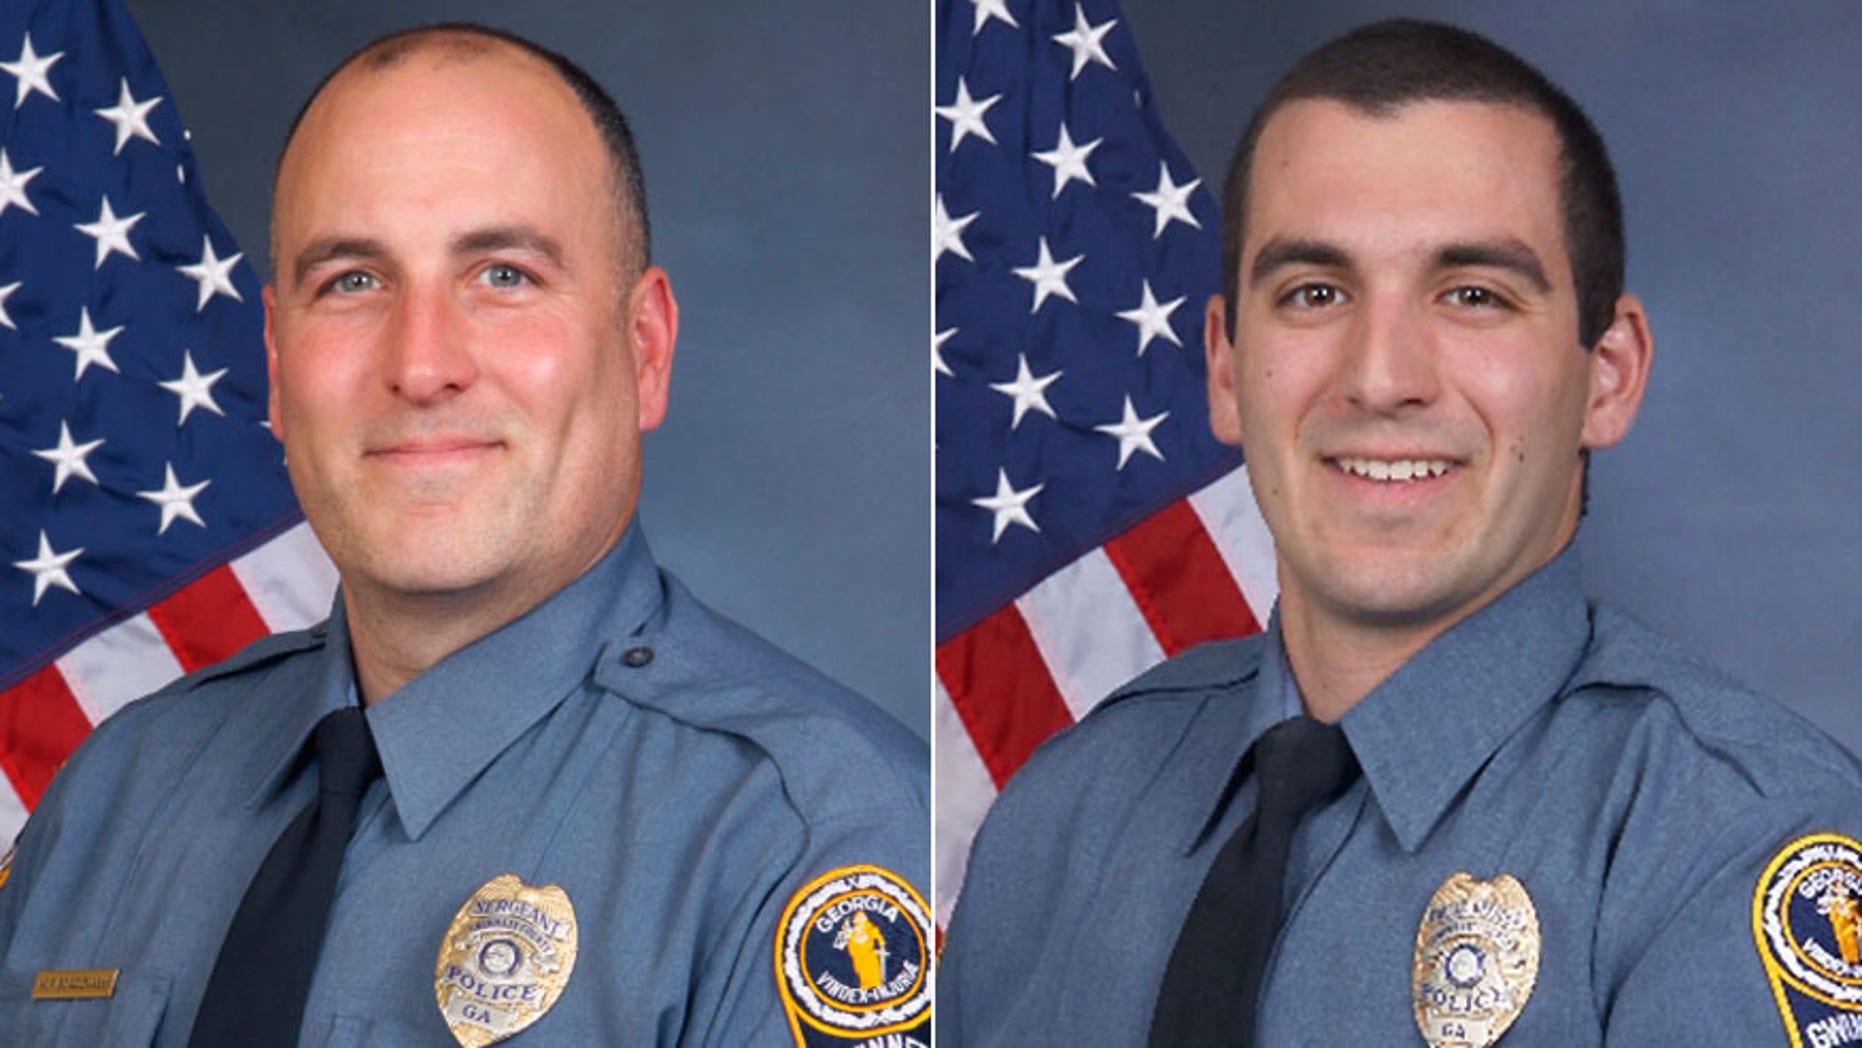 Gwinnett County Sgt. Michael Bongiovanni and Master Police Officer Robert McDonald